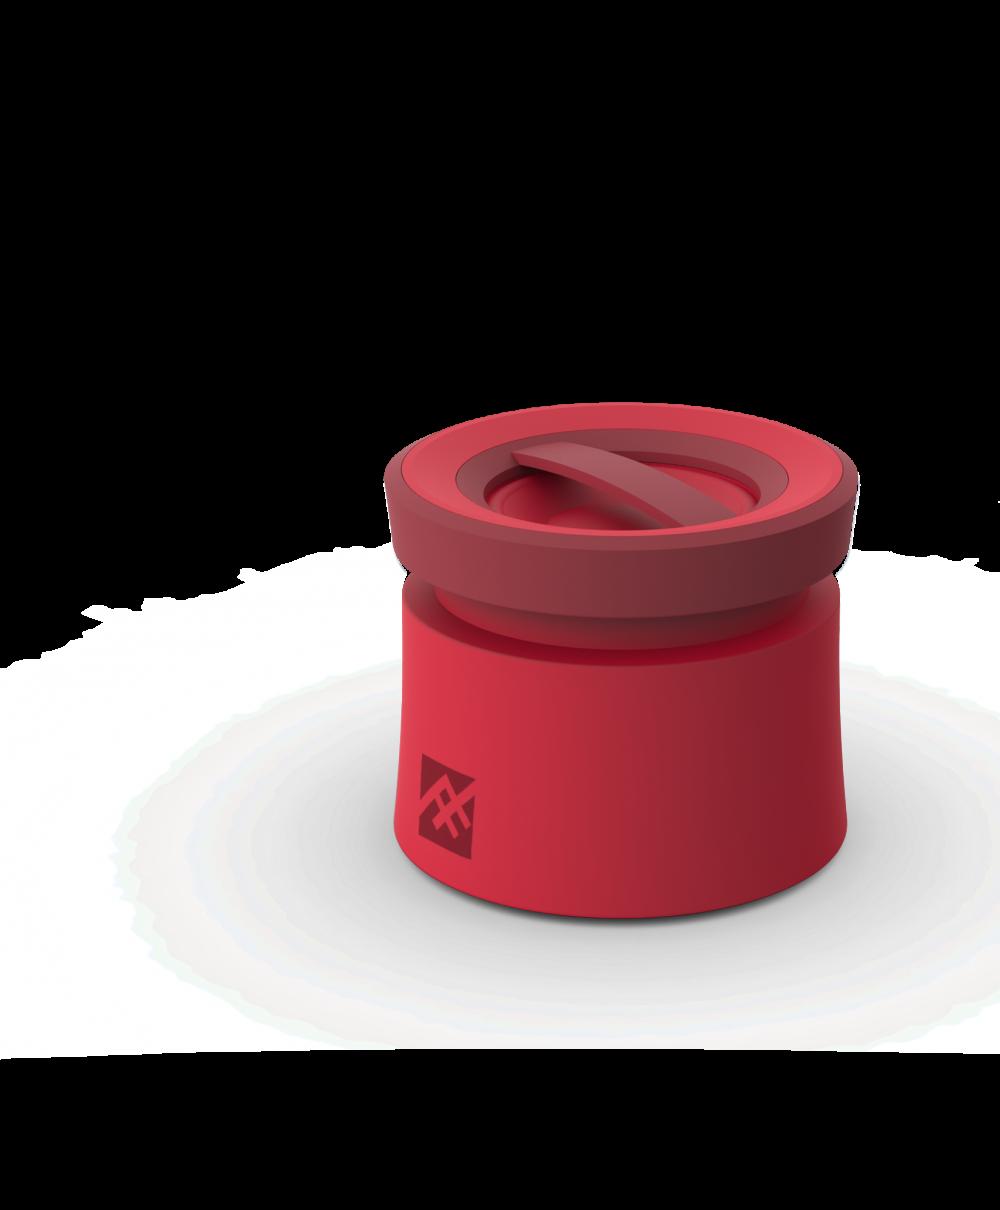 Портативная Bluetooth колонка iFrogz Coda Bluetooth Speaker с микрофоном Red (IFOPBS-RD0)